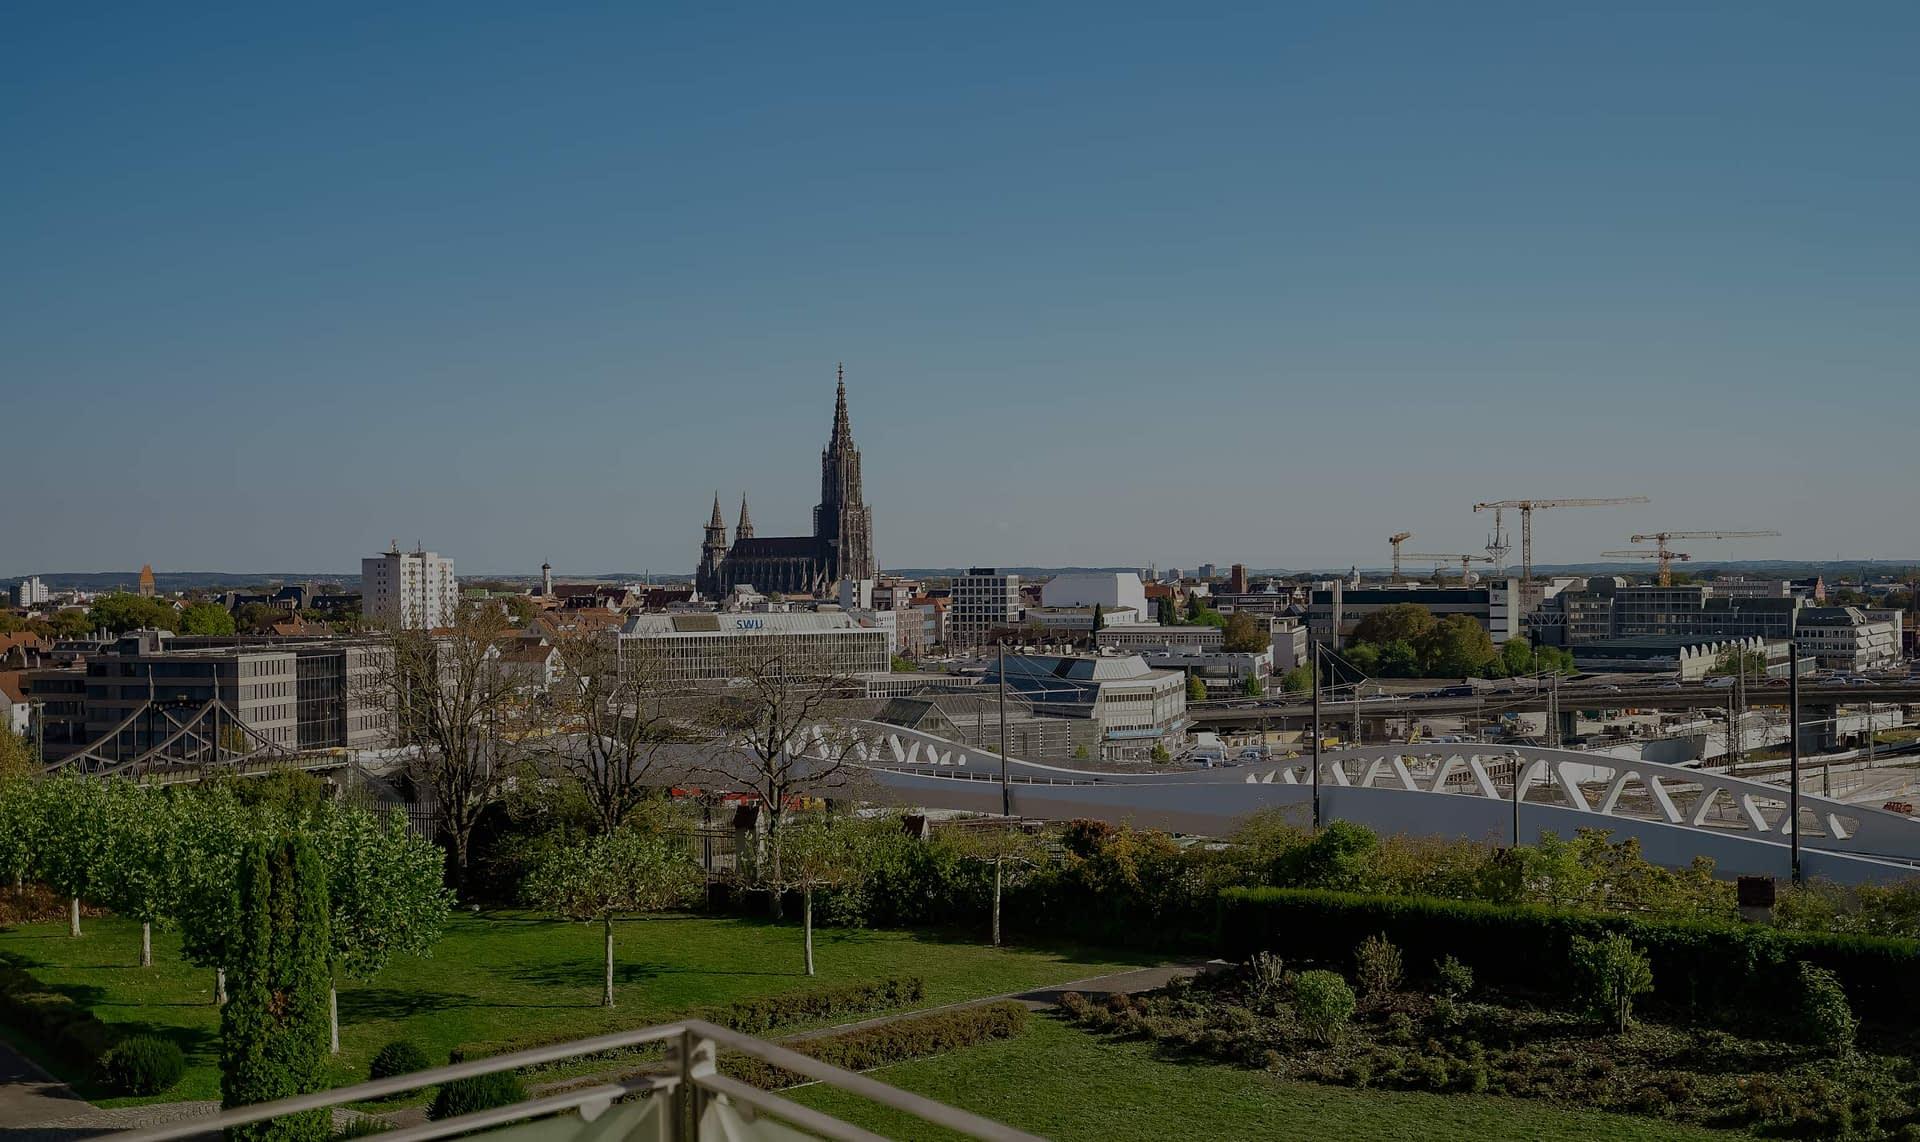 Ihr Immobilienmakler in Ulm & Neu-Ulm